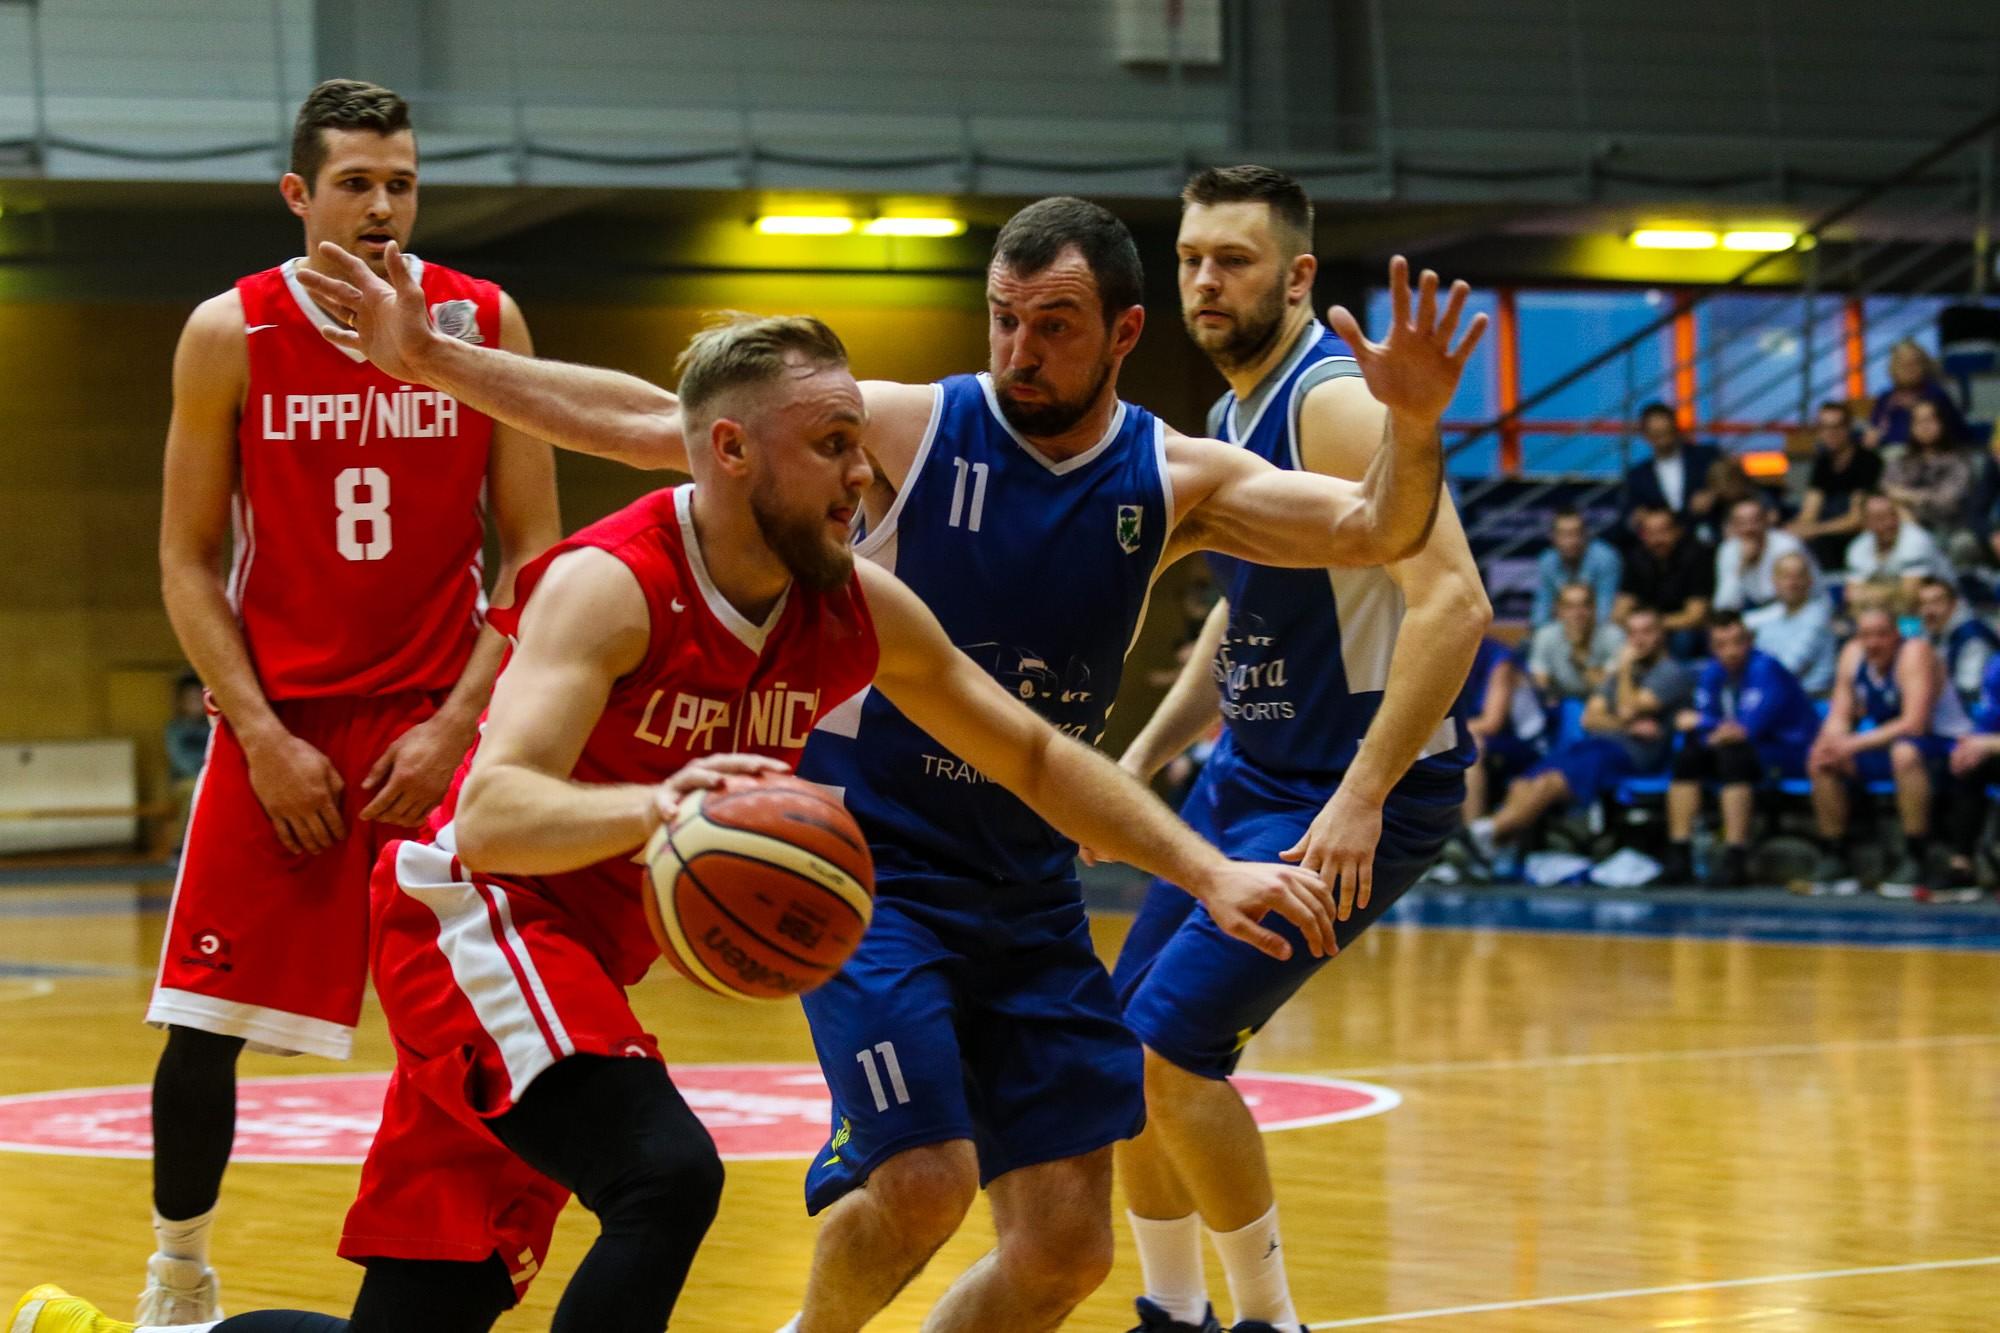 """LPPP/Ница"" и ""Kempings ODS"" стали чемпионами города по баскетболу"